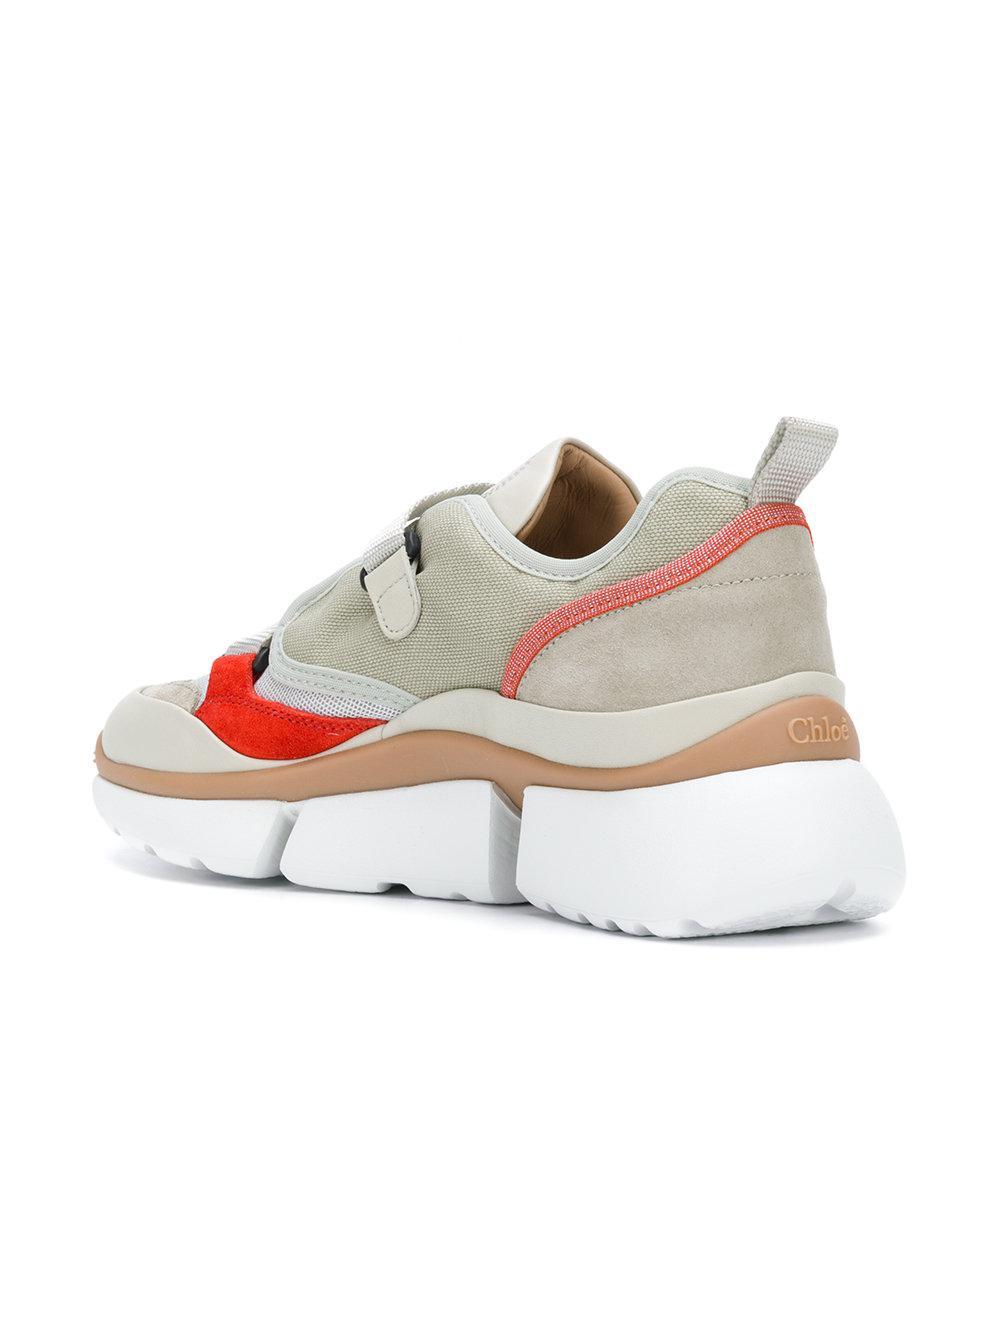 ridged platform futuristic sneakers - Green Chloé sRbrdKo